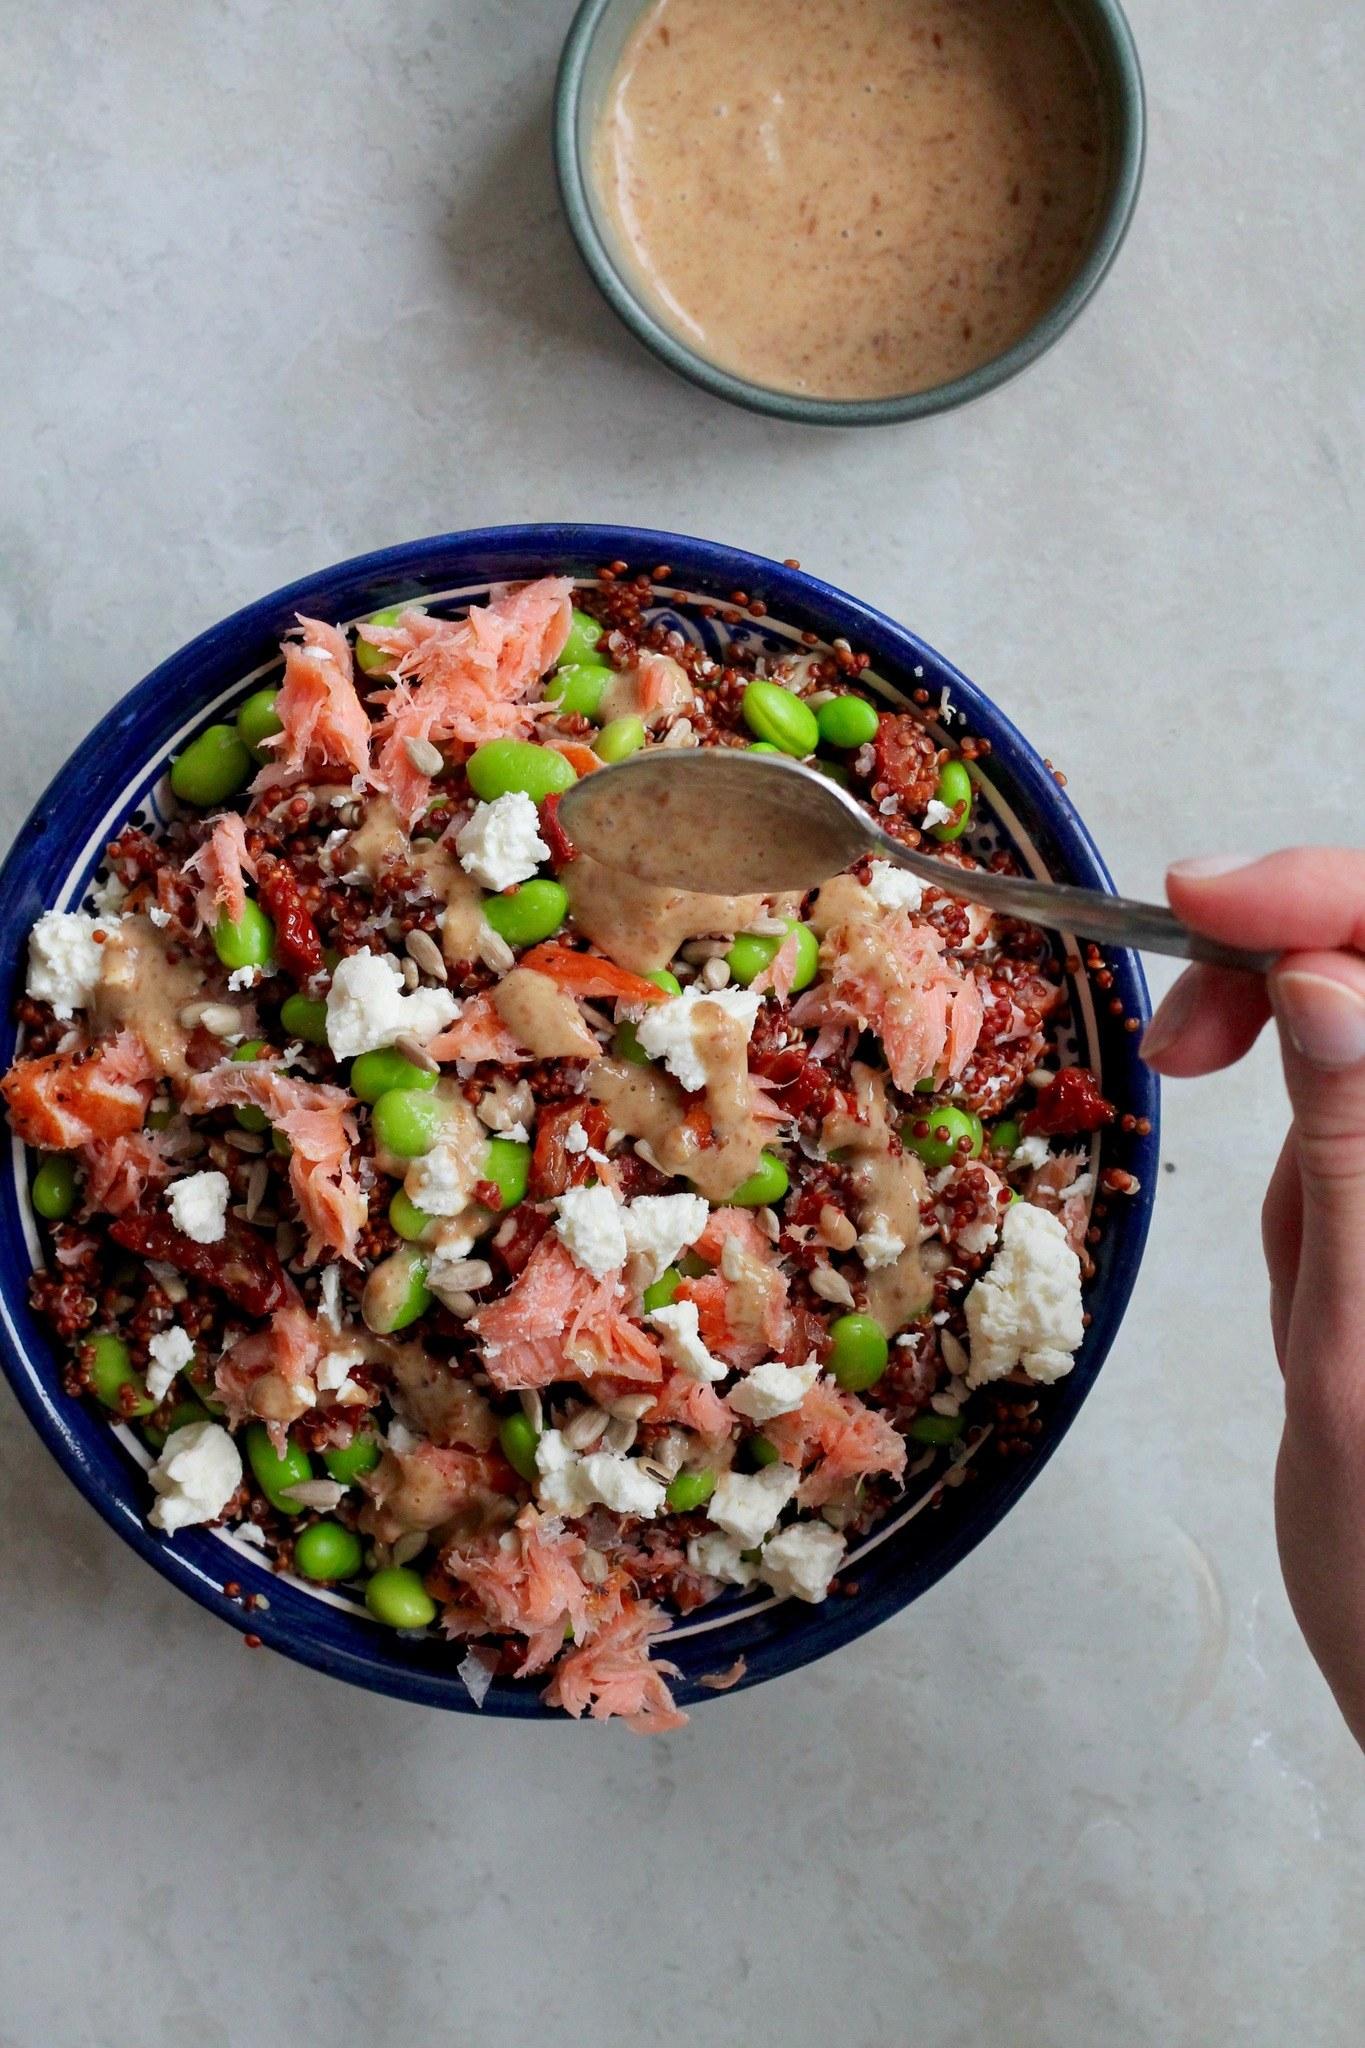 Quinoasalat med varmrøget laks, feta, edamamebønner og gomadressing